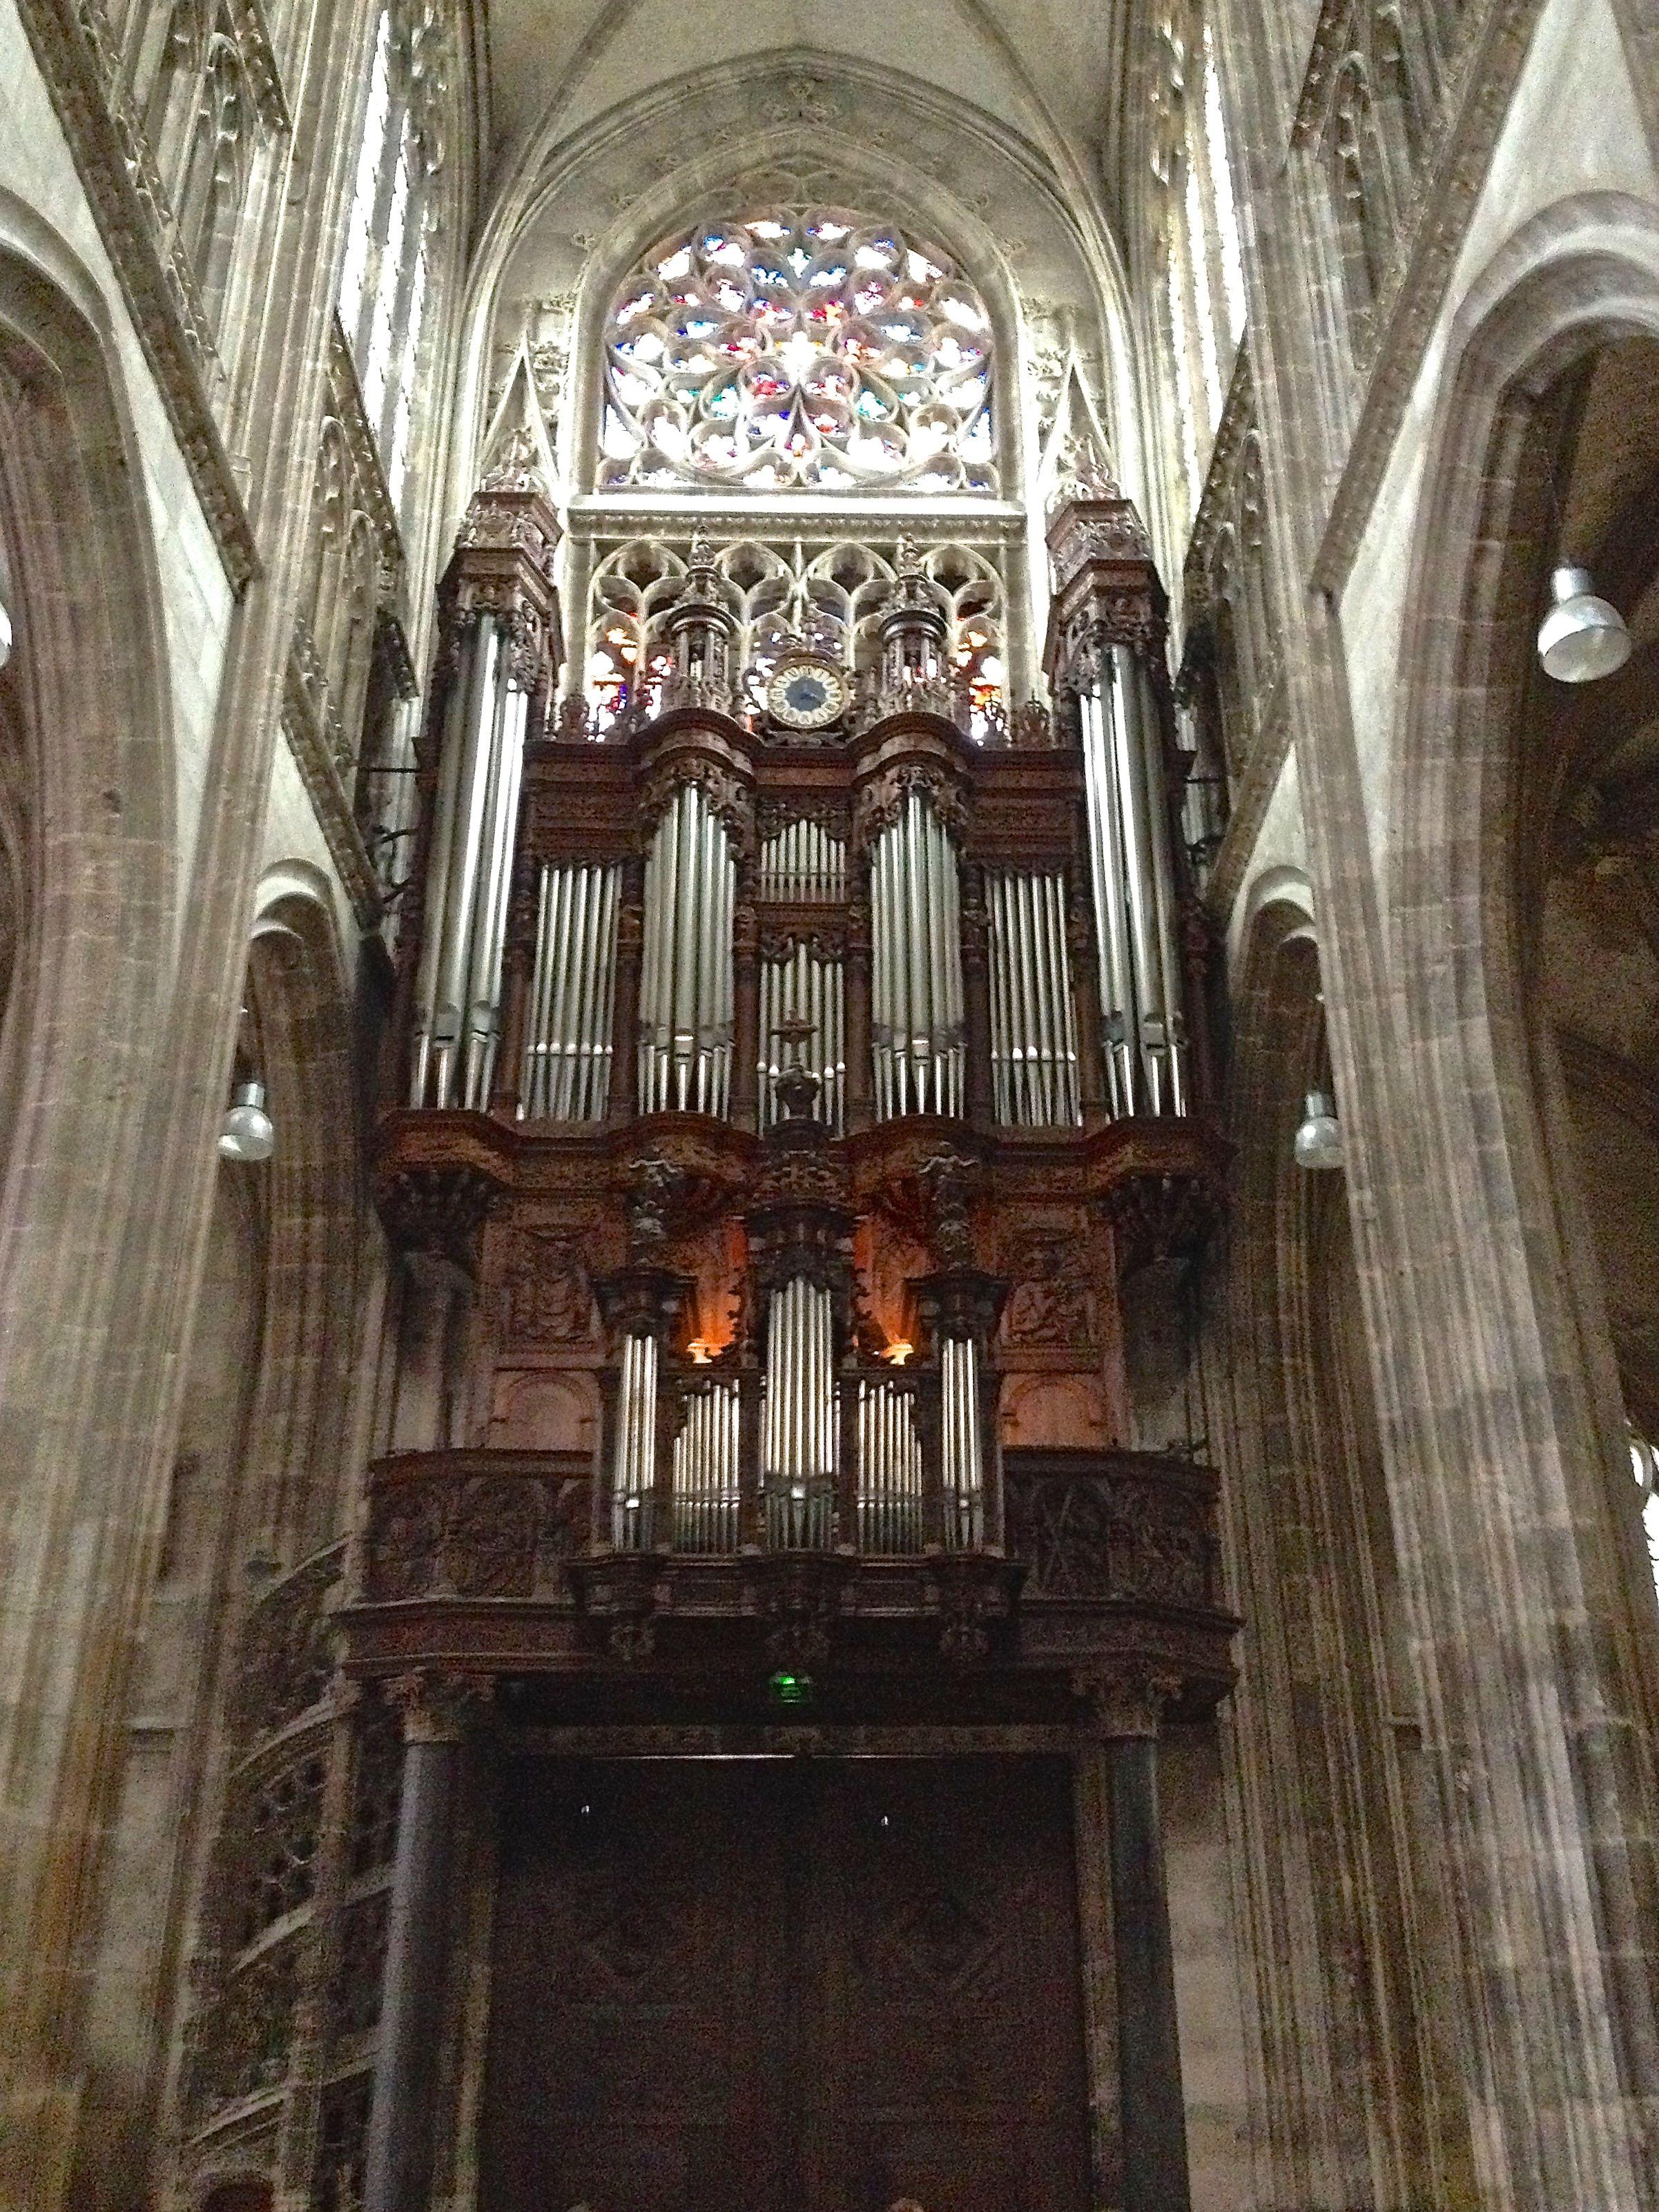 kern organ st maclou rouen france concert july 15 2014 organs i 39 ve played around the. Black Bedroom Furniture Sets. Home Design Ideas